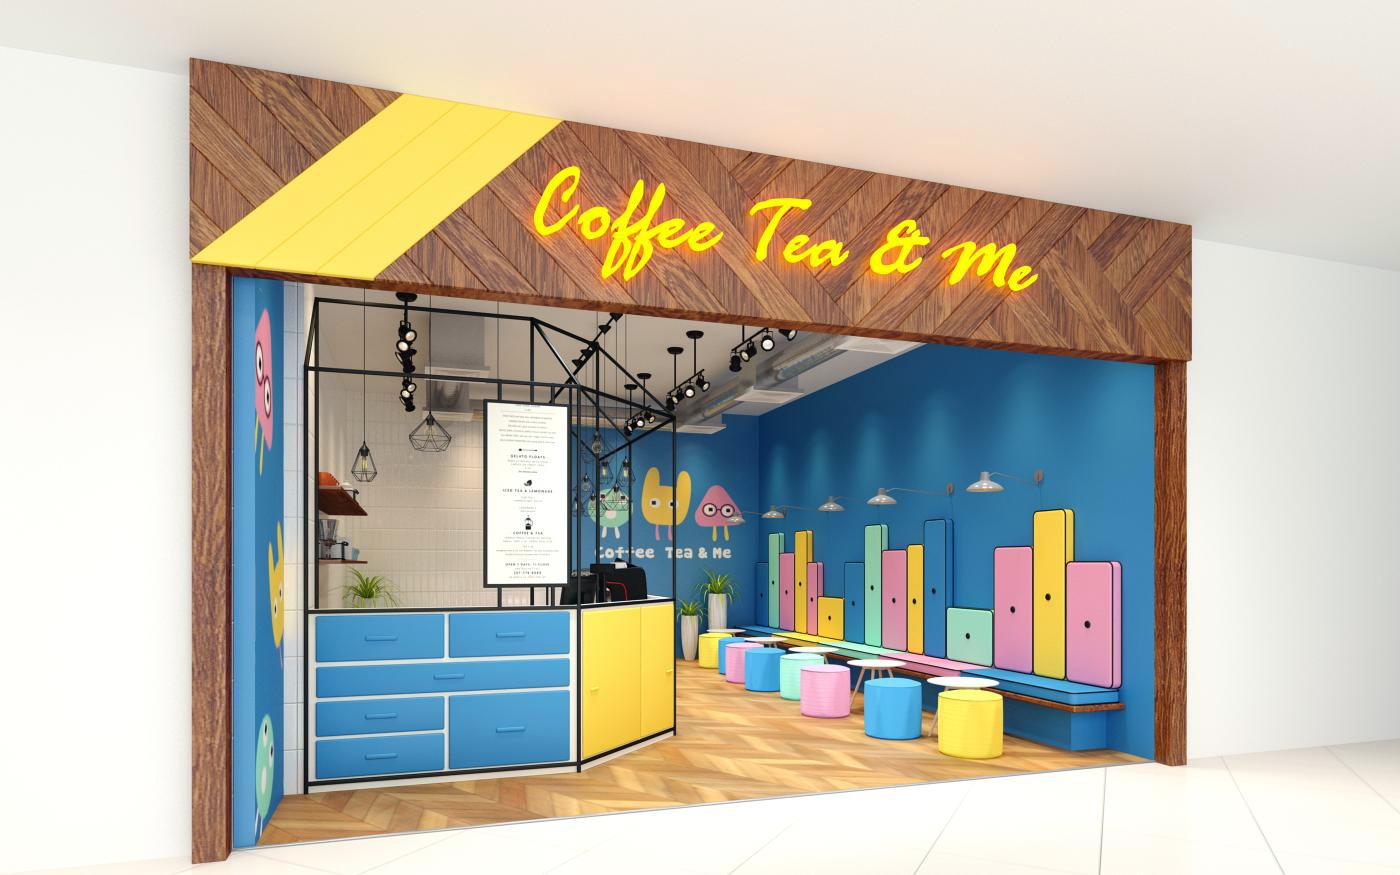 Coffee Tea & Me Express